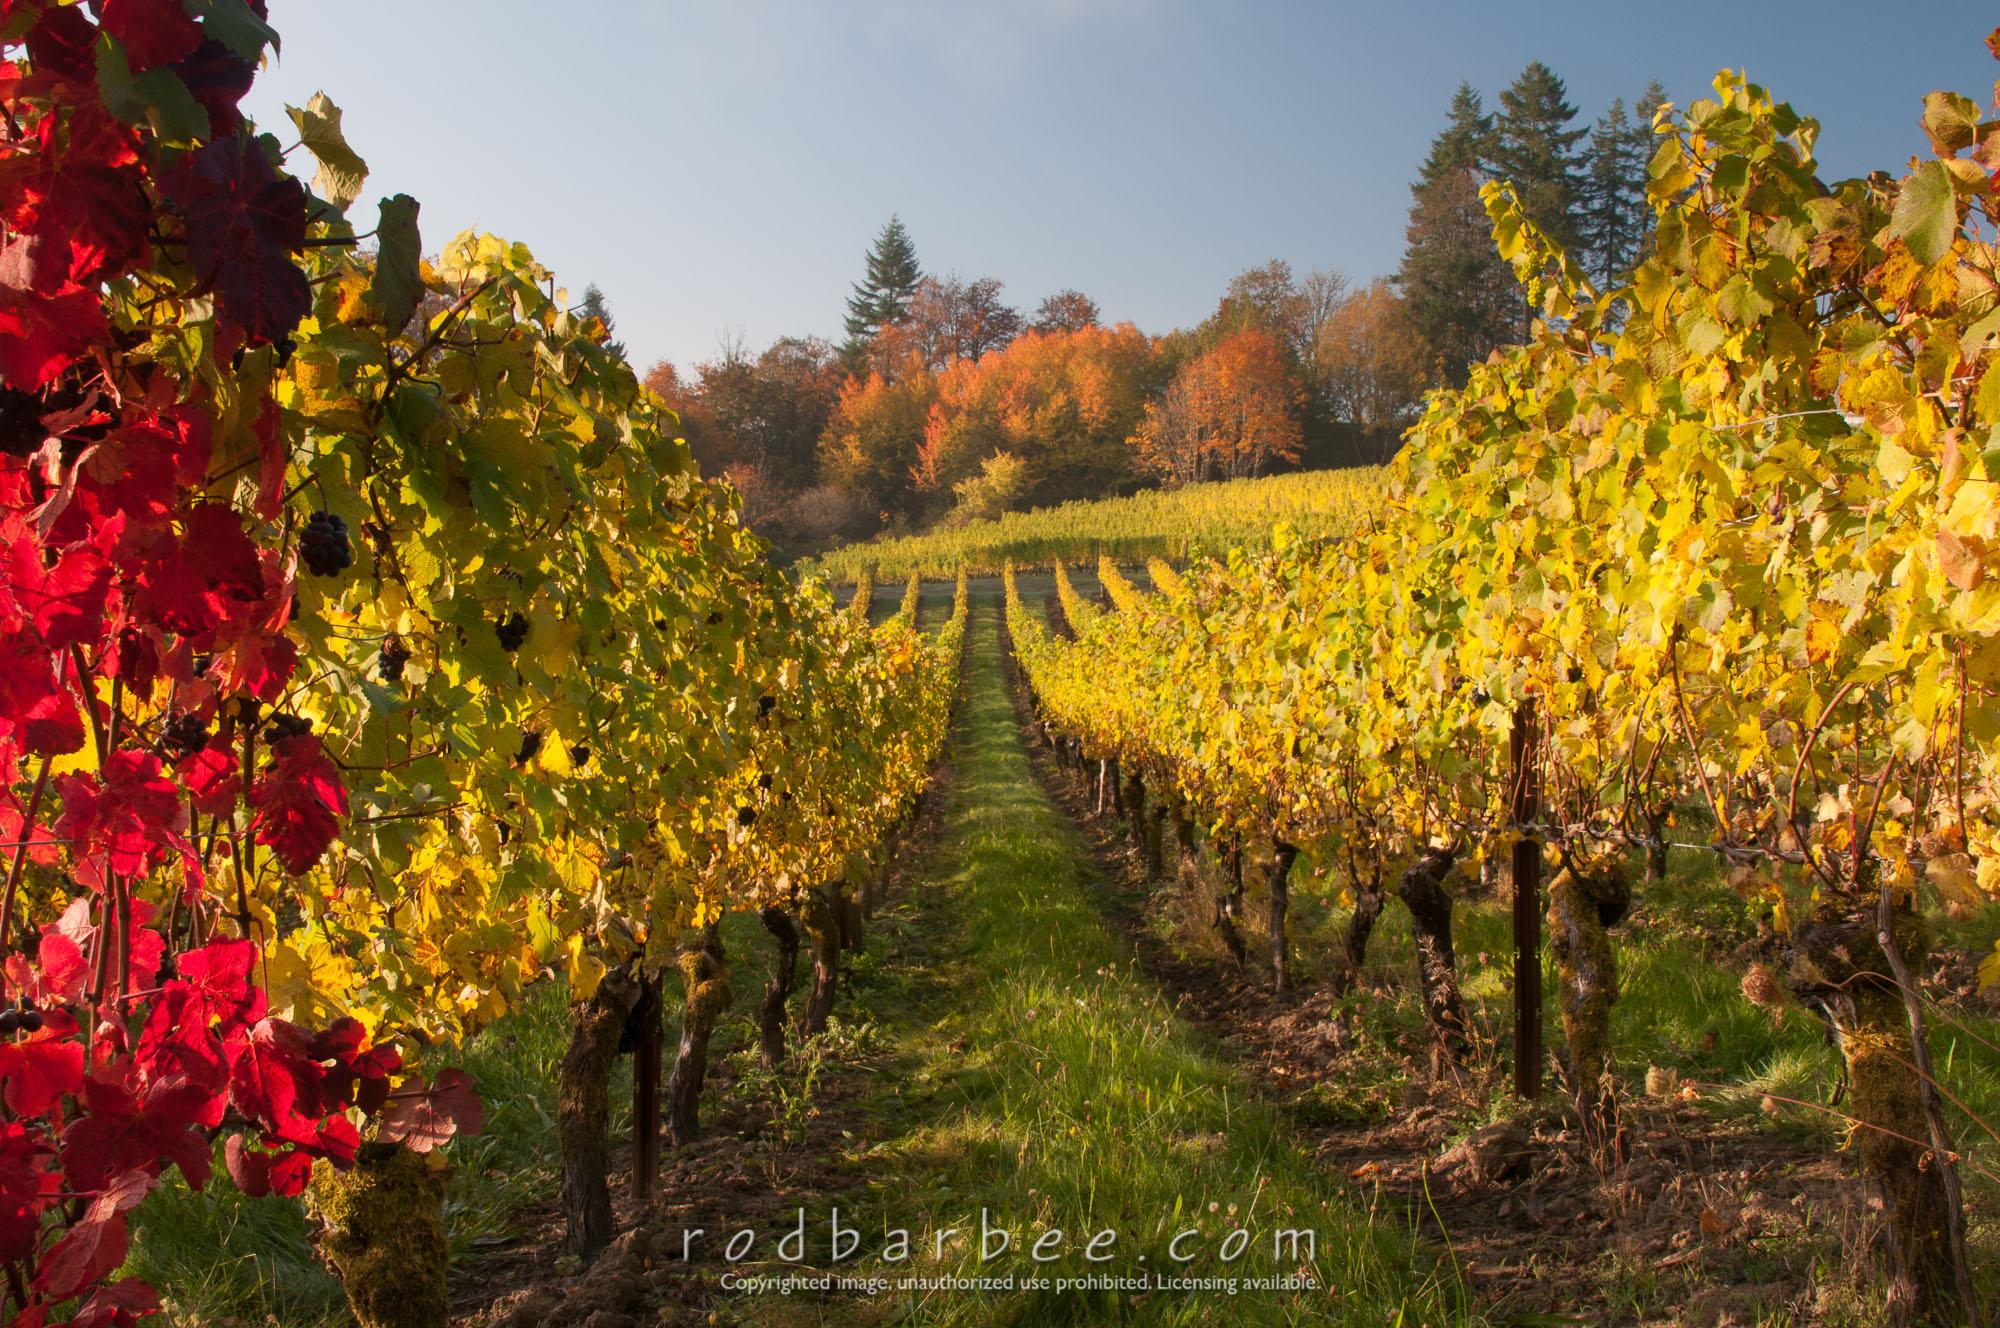 Barbee_131017_3_3184 |  Elk Cove Winery